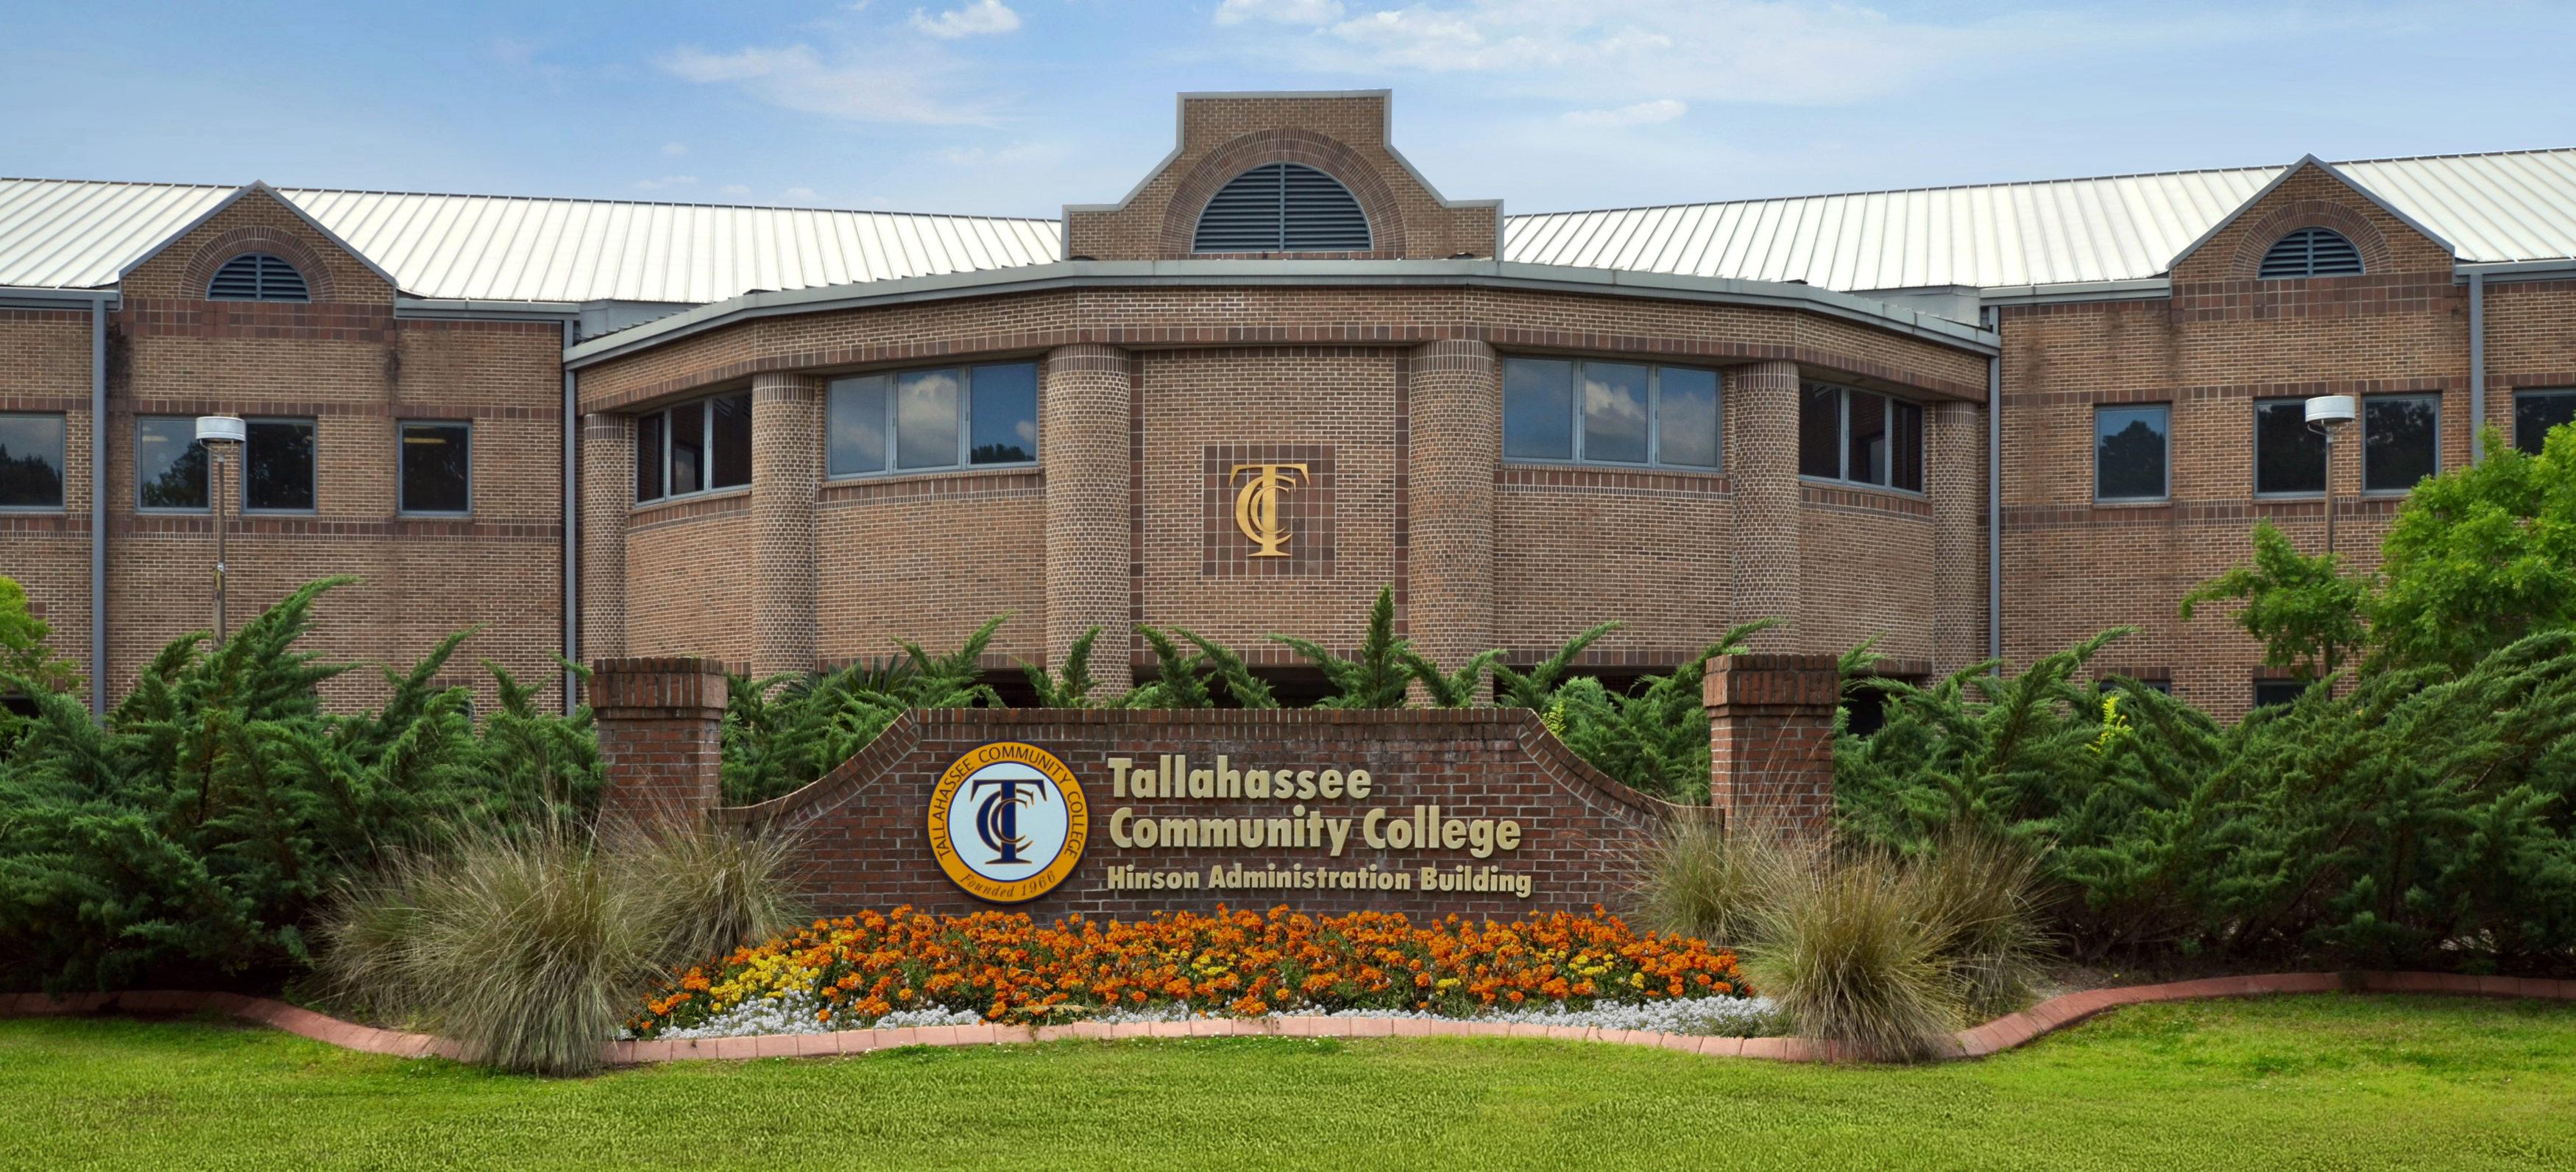 TCC-tallahassee-community-college-e1484228099907-3500x1592.jpg